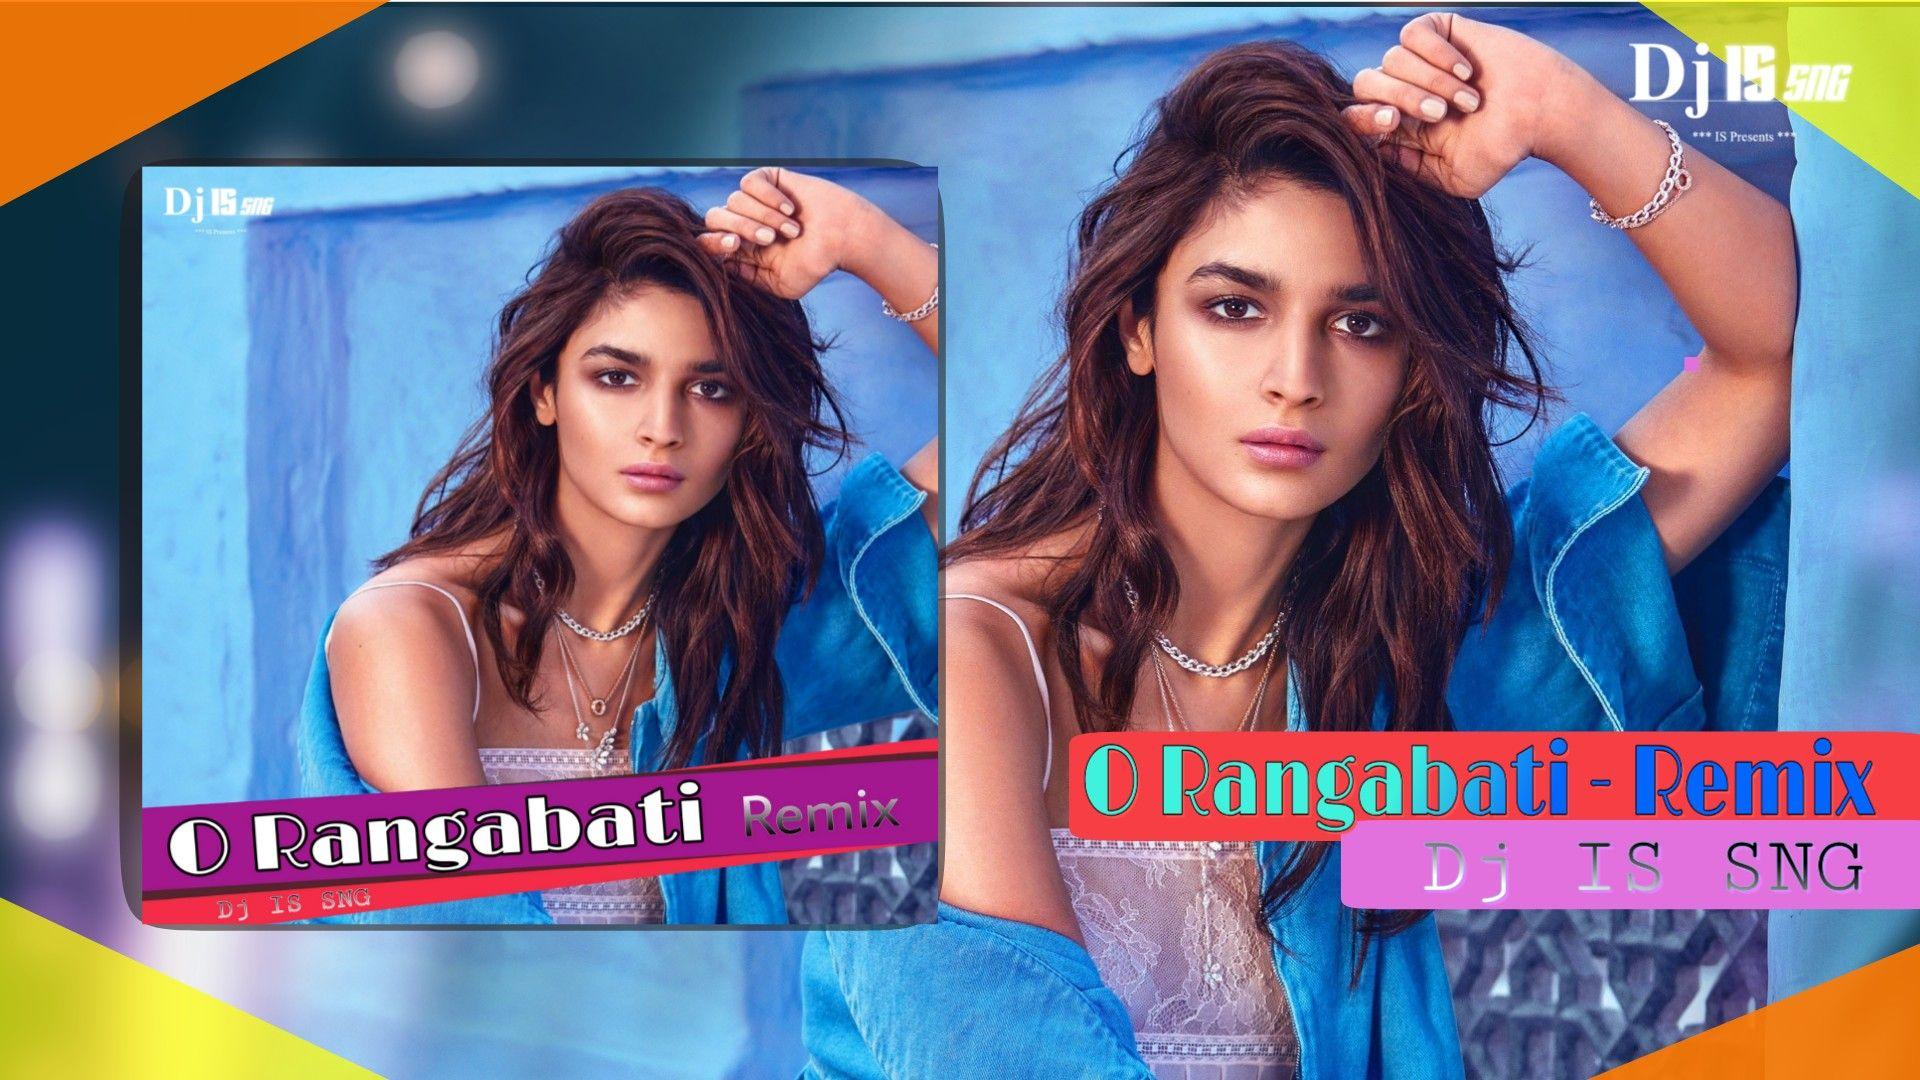 O Rangabati Remix Dj Is Sng Kuldeep Pattanaik Rs Kumar Odia Dj Song Odia Remix Dj 2020 In 2020 Dj Songs Remix Music Dj Remix Music